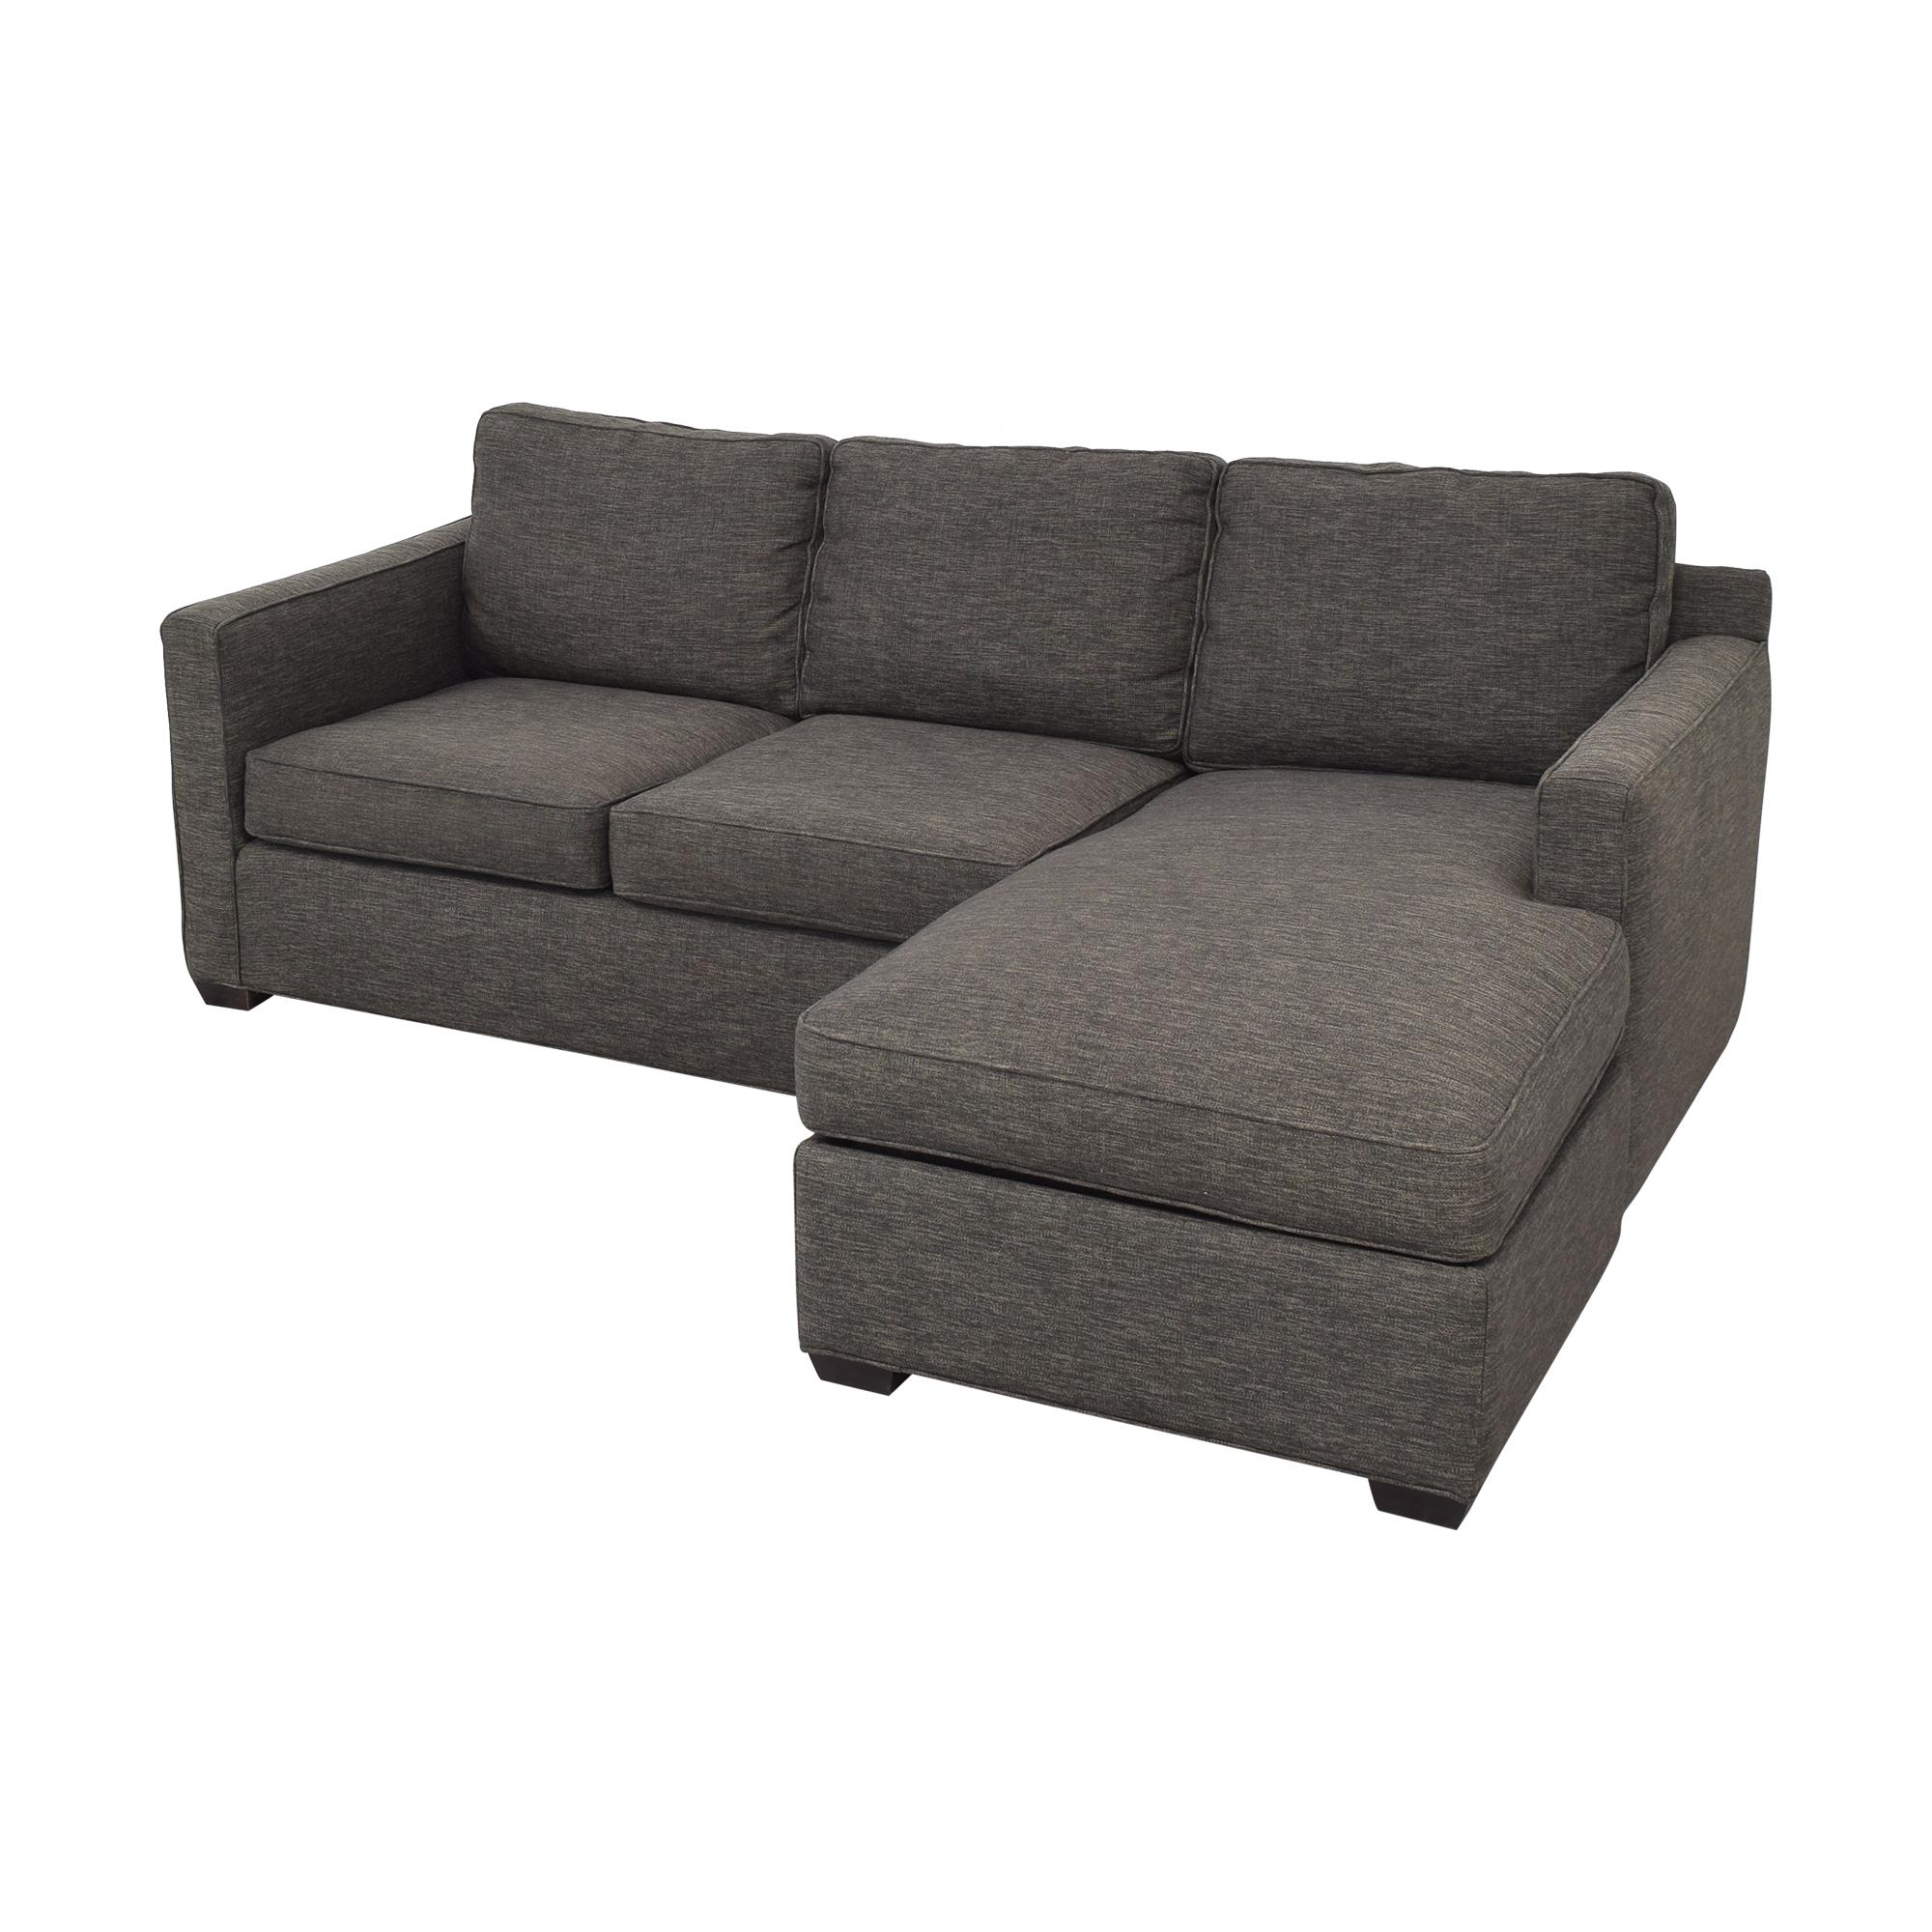 buy Crate & Barrel Davis Sectional Sofa Crate & Barrel Sofas